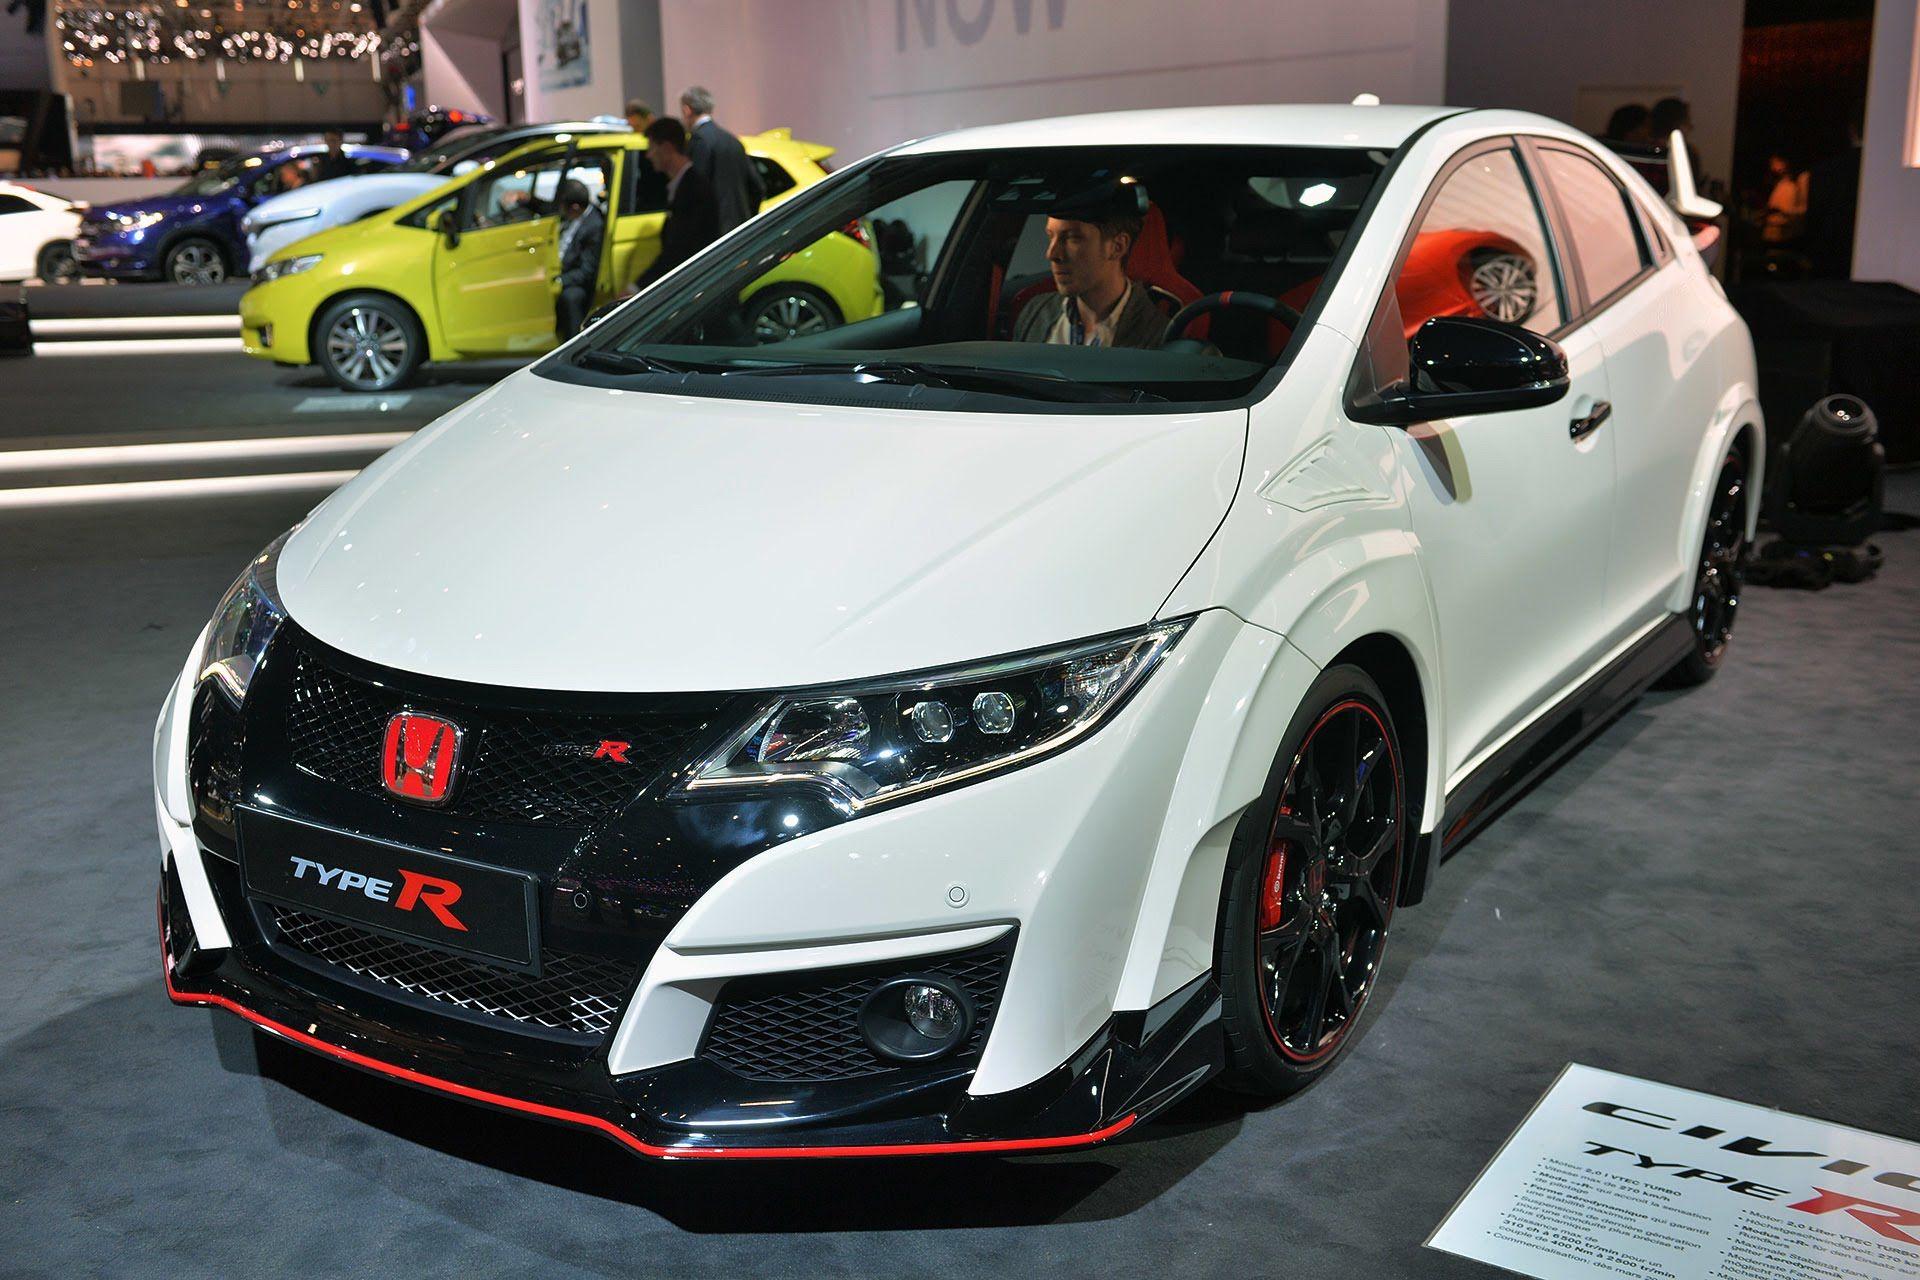 2016 Honda Civic Type R 2015 Geneva Motor Show Future Cars